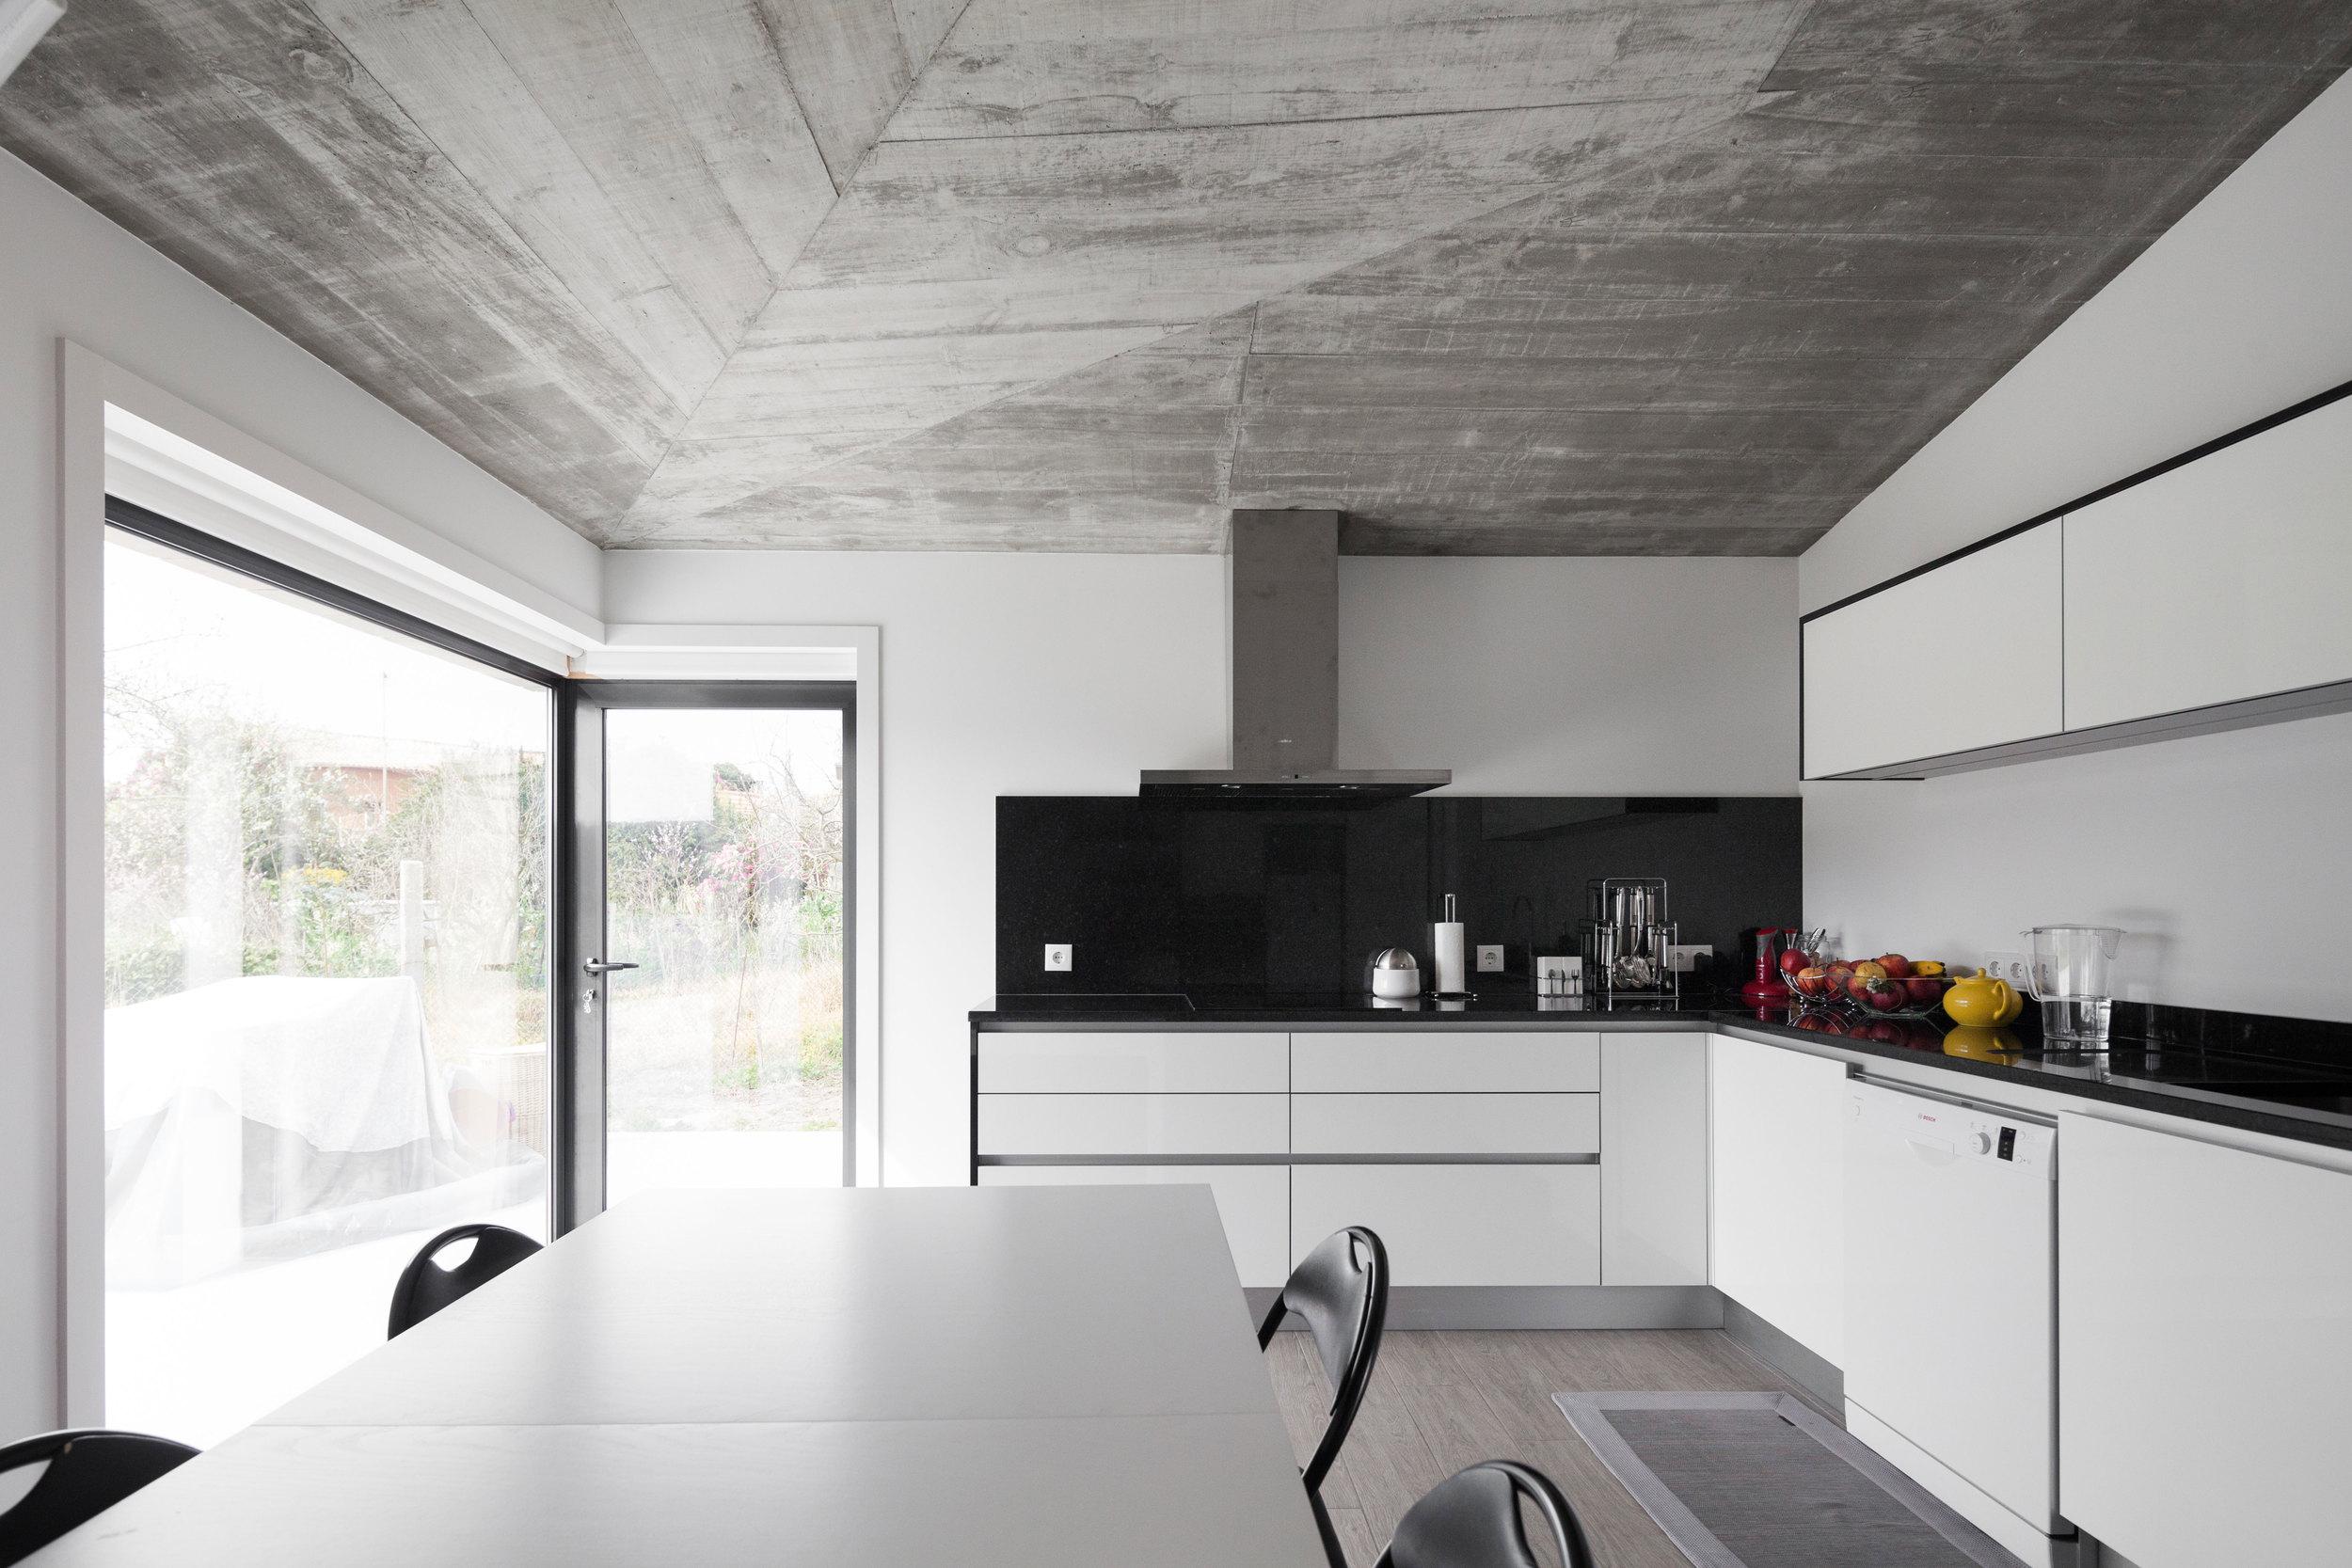 PROD_Open_patio_house_kitchen_view.jpg